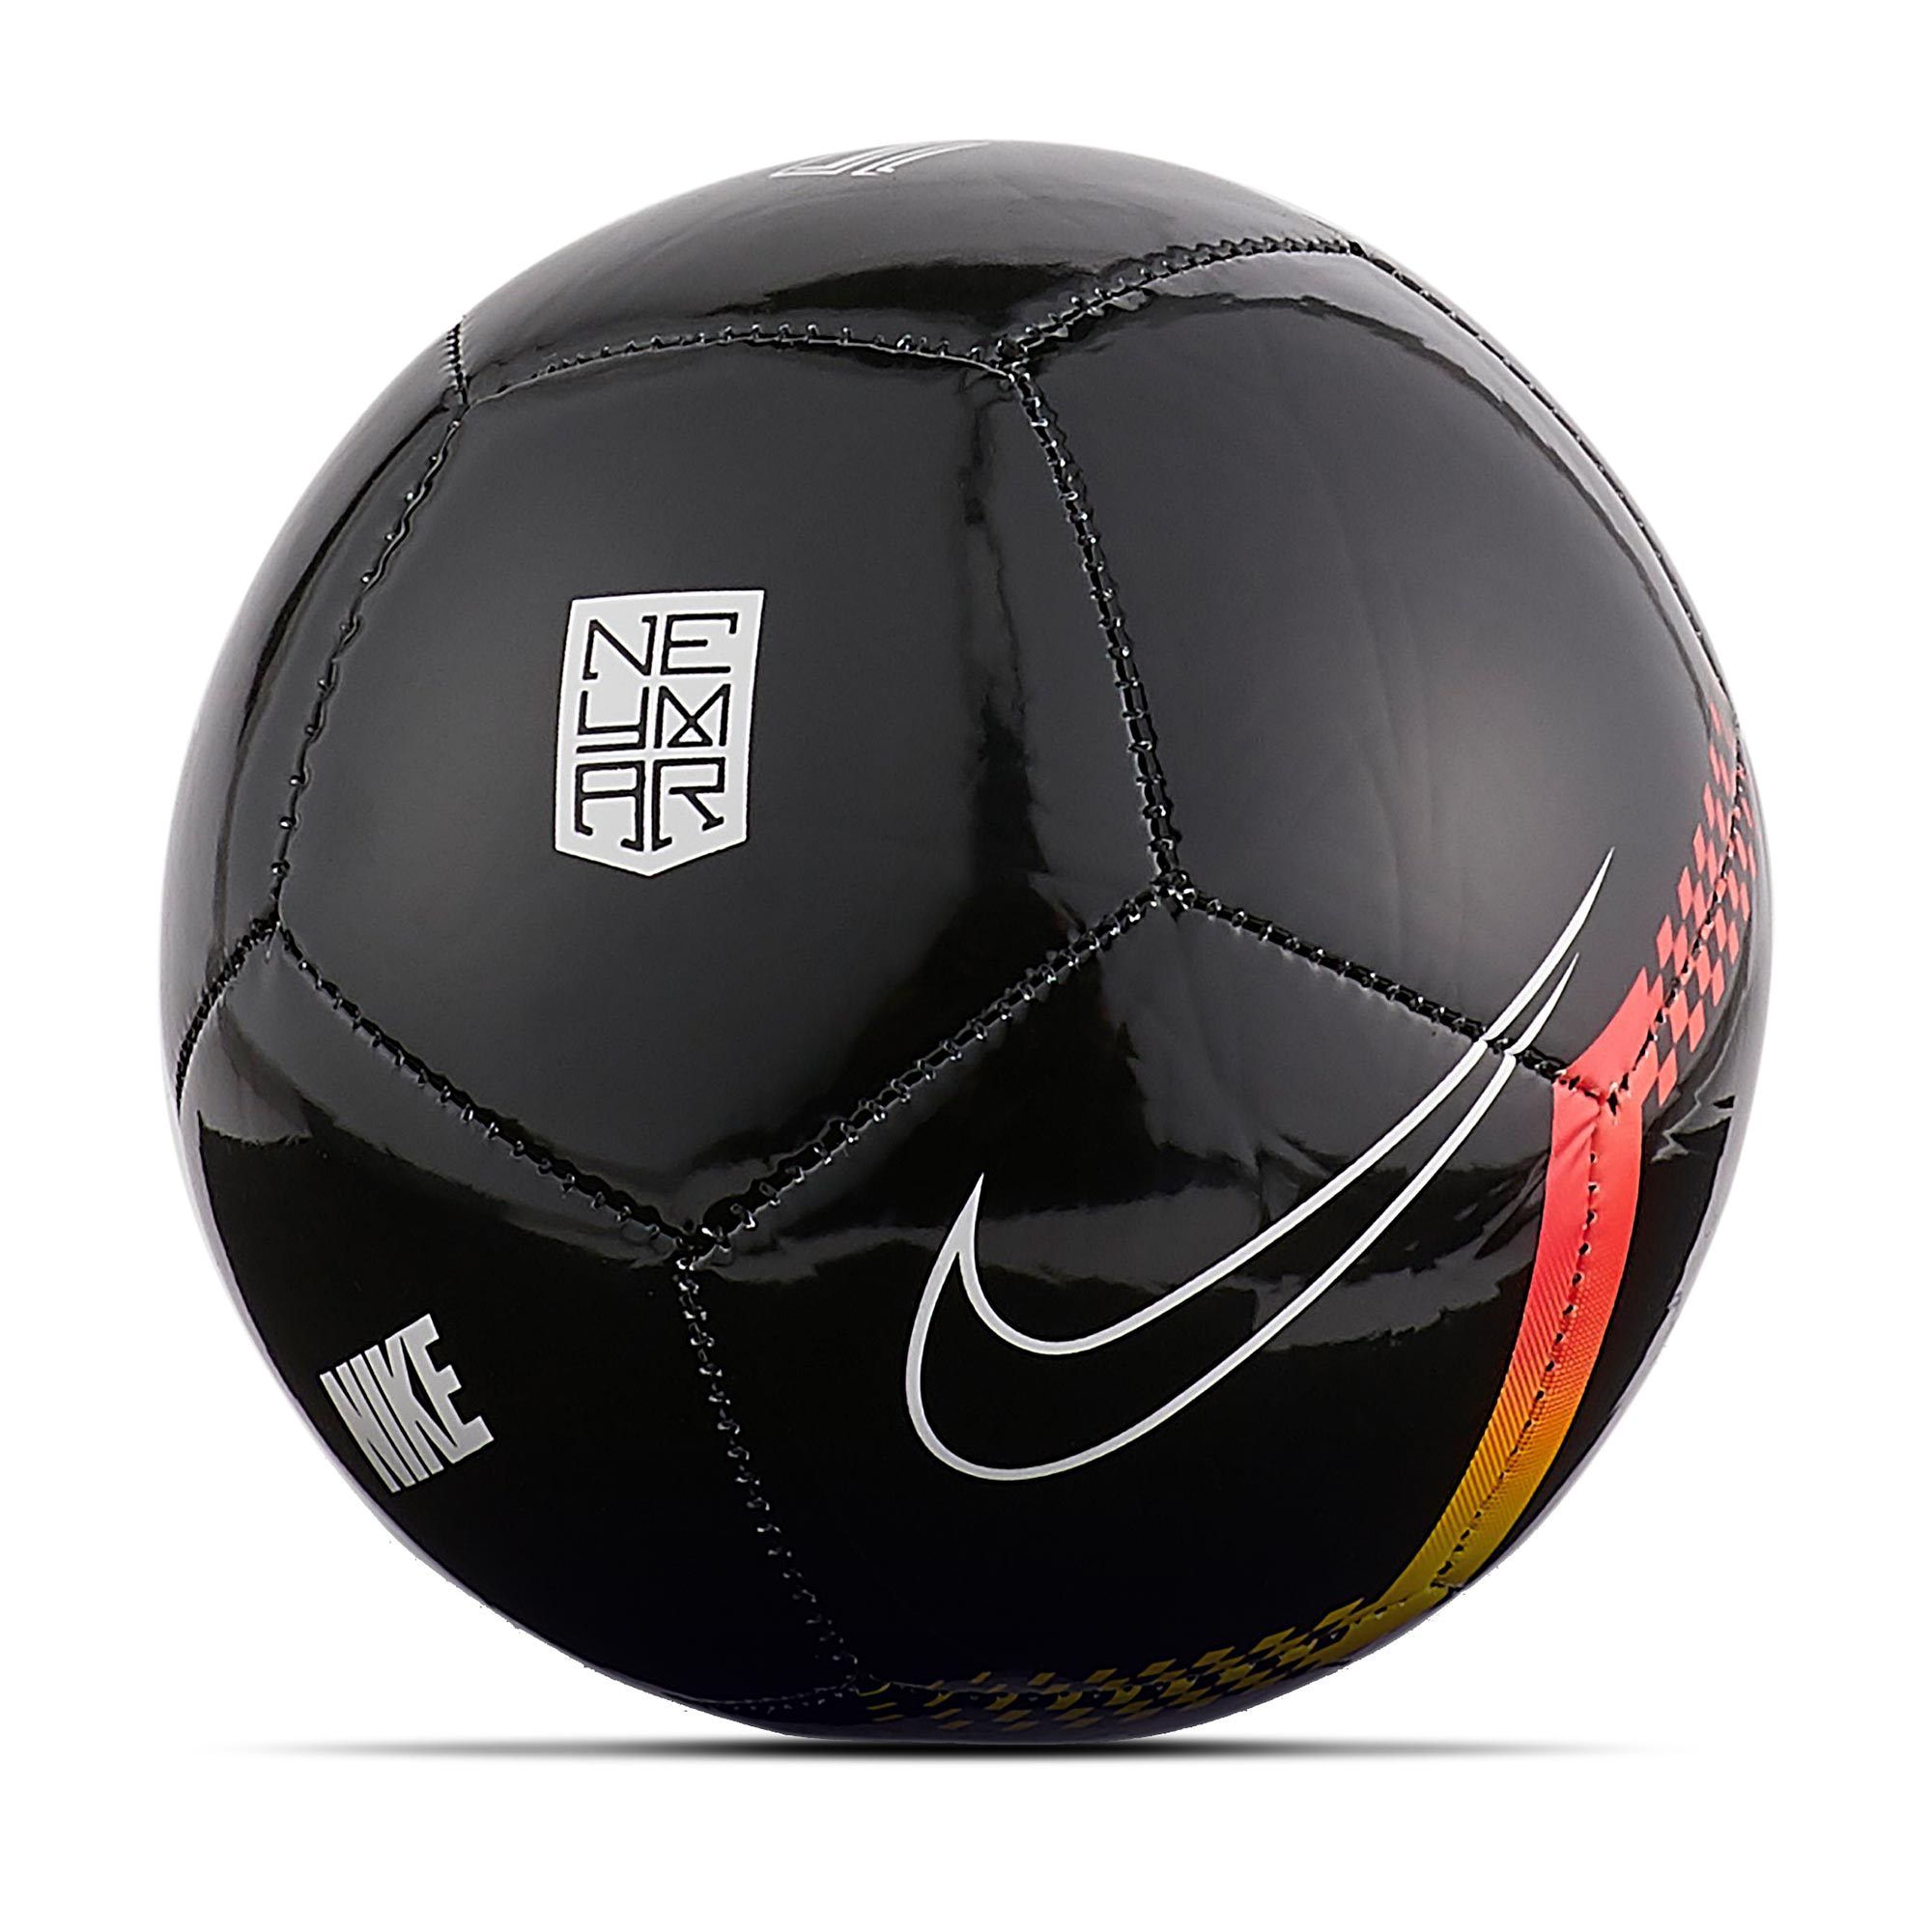 Balón de fútbol Nike Neymar Skills - negro